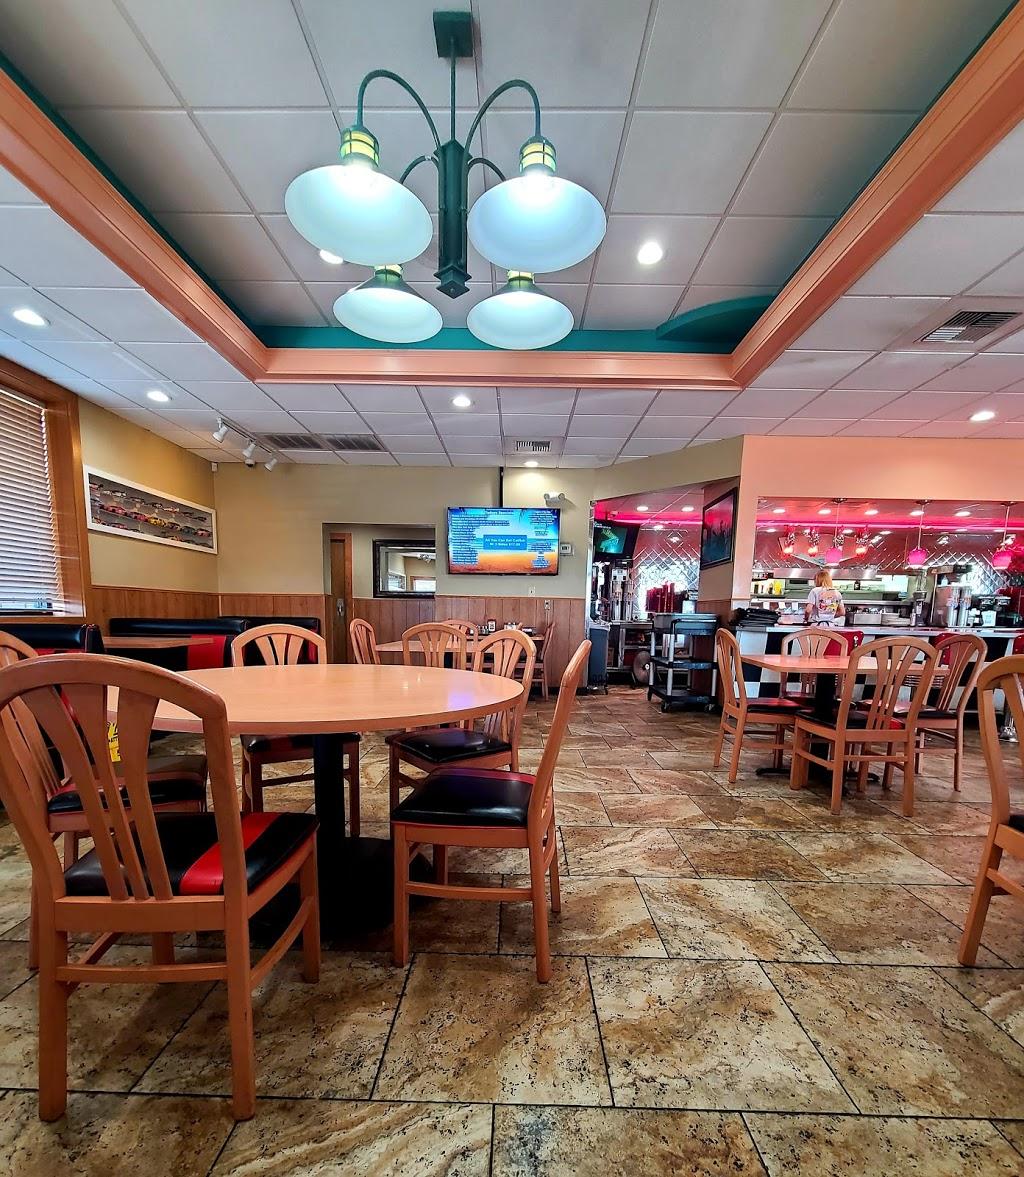 Freeway Cafe West - cafe    Photo 1 of 10   Address: 5849 S 49th W Ave, Tulsa, OK 74107, USA   Phone: (918) 292-8678